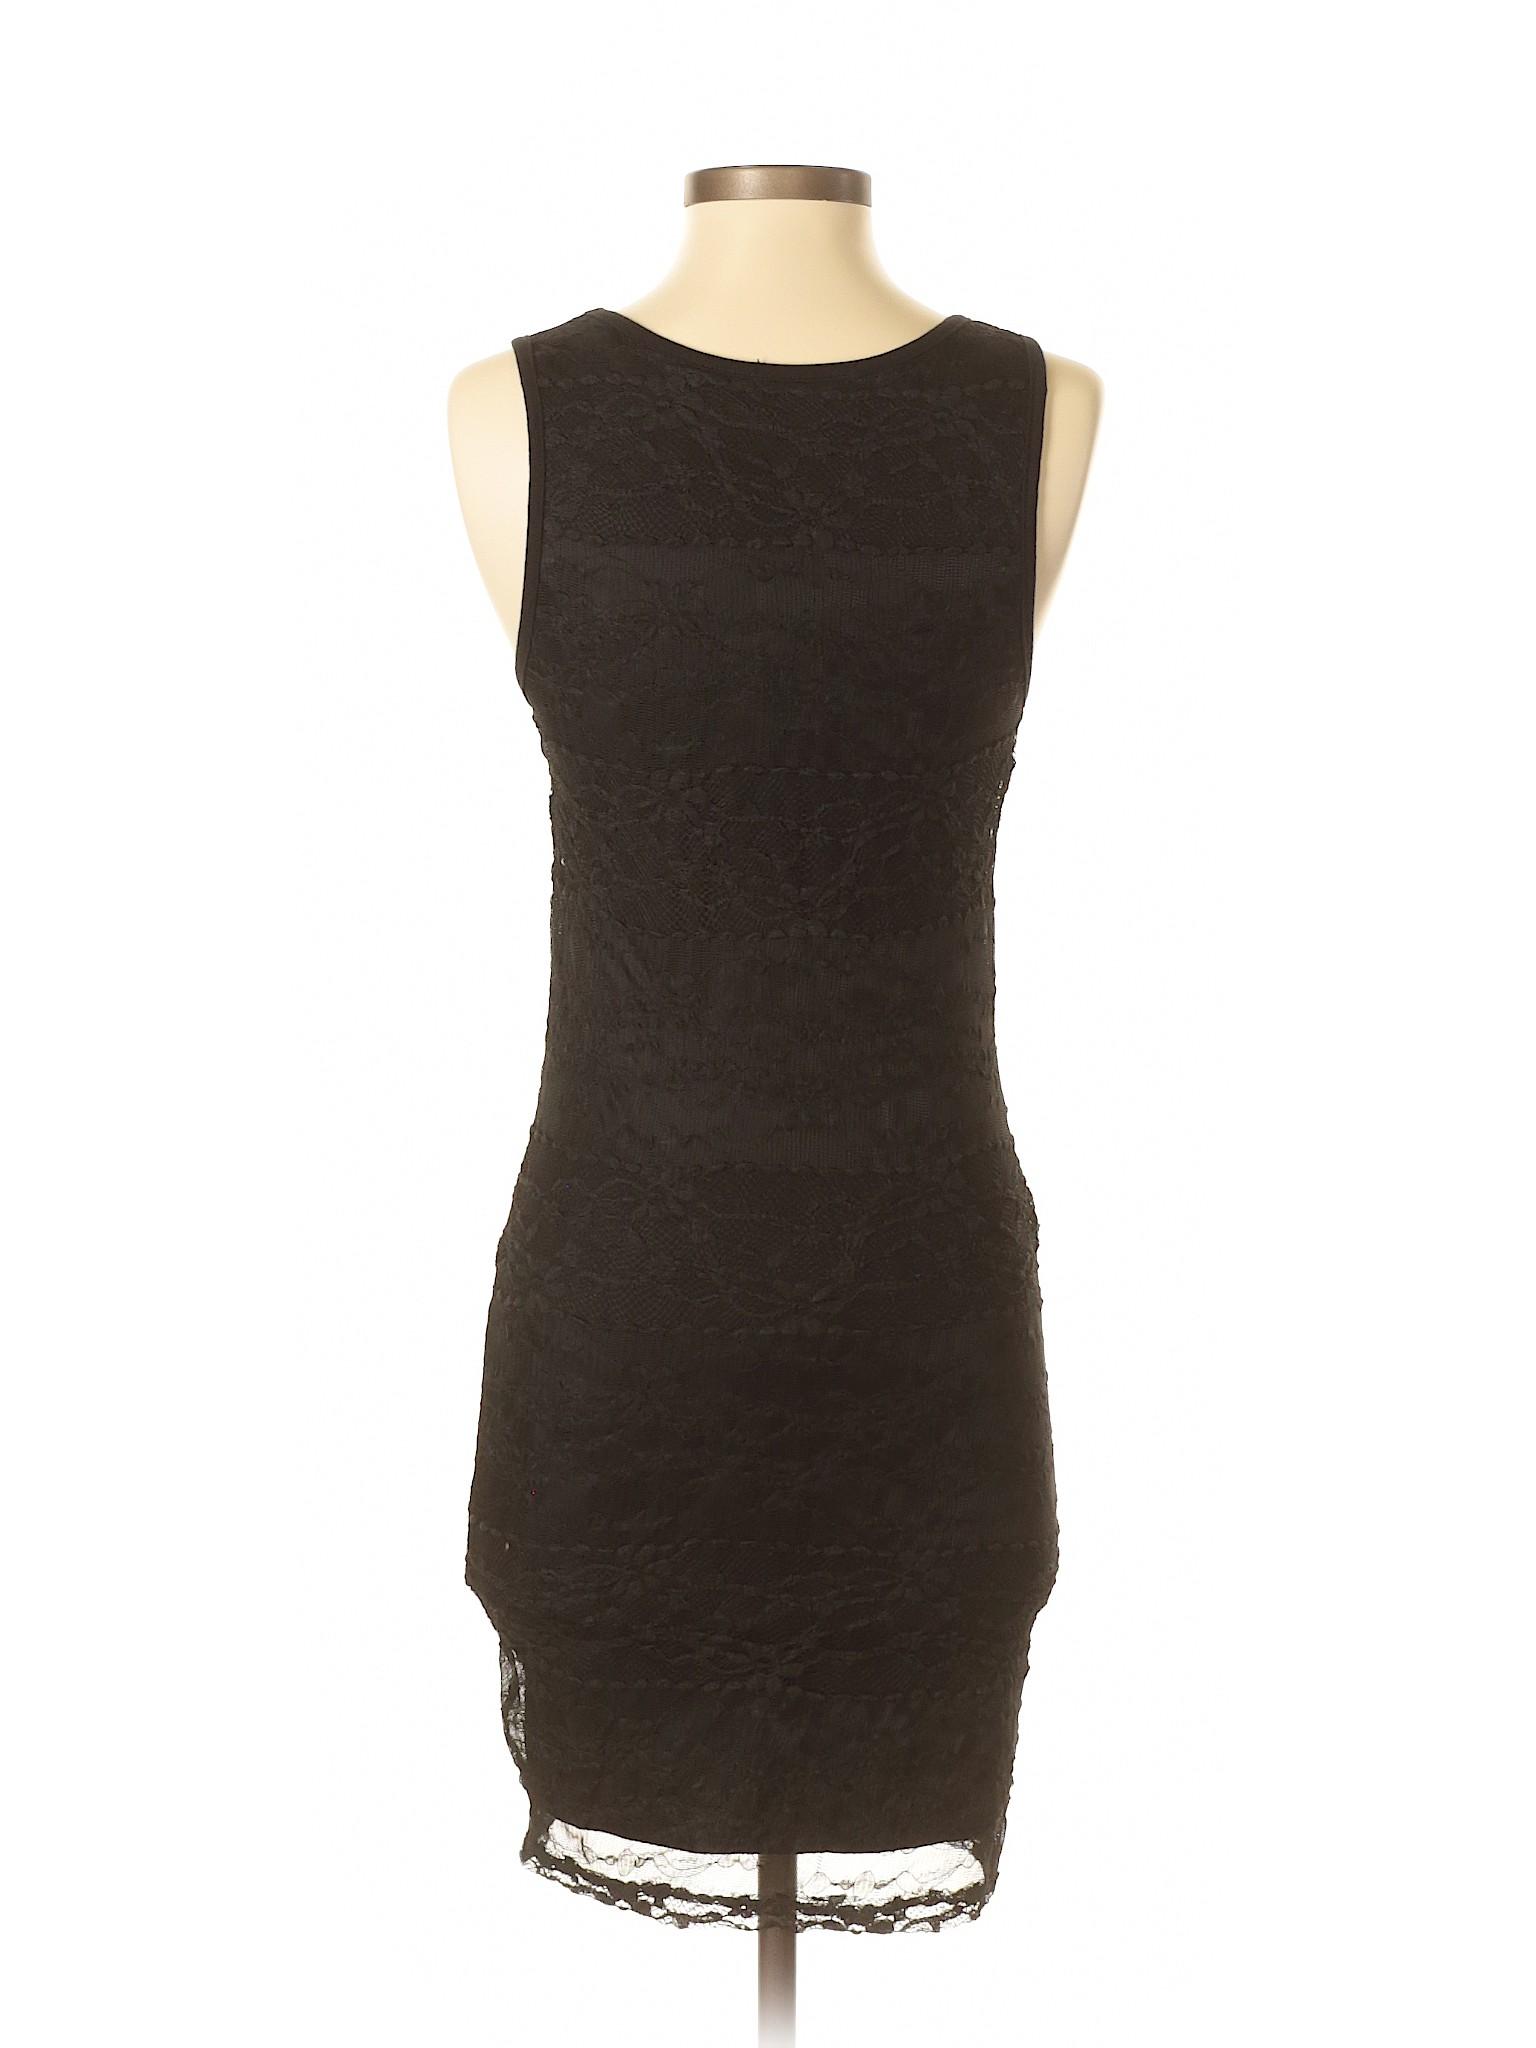 Casual Casual Selling XXI Selling Casual Selling Selling Dress XXI Dress XXI Dress wqtnvxfR1